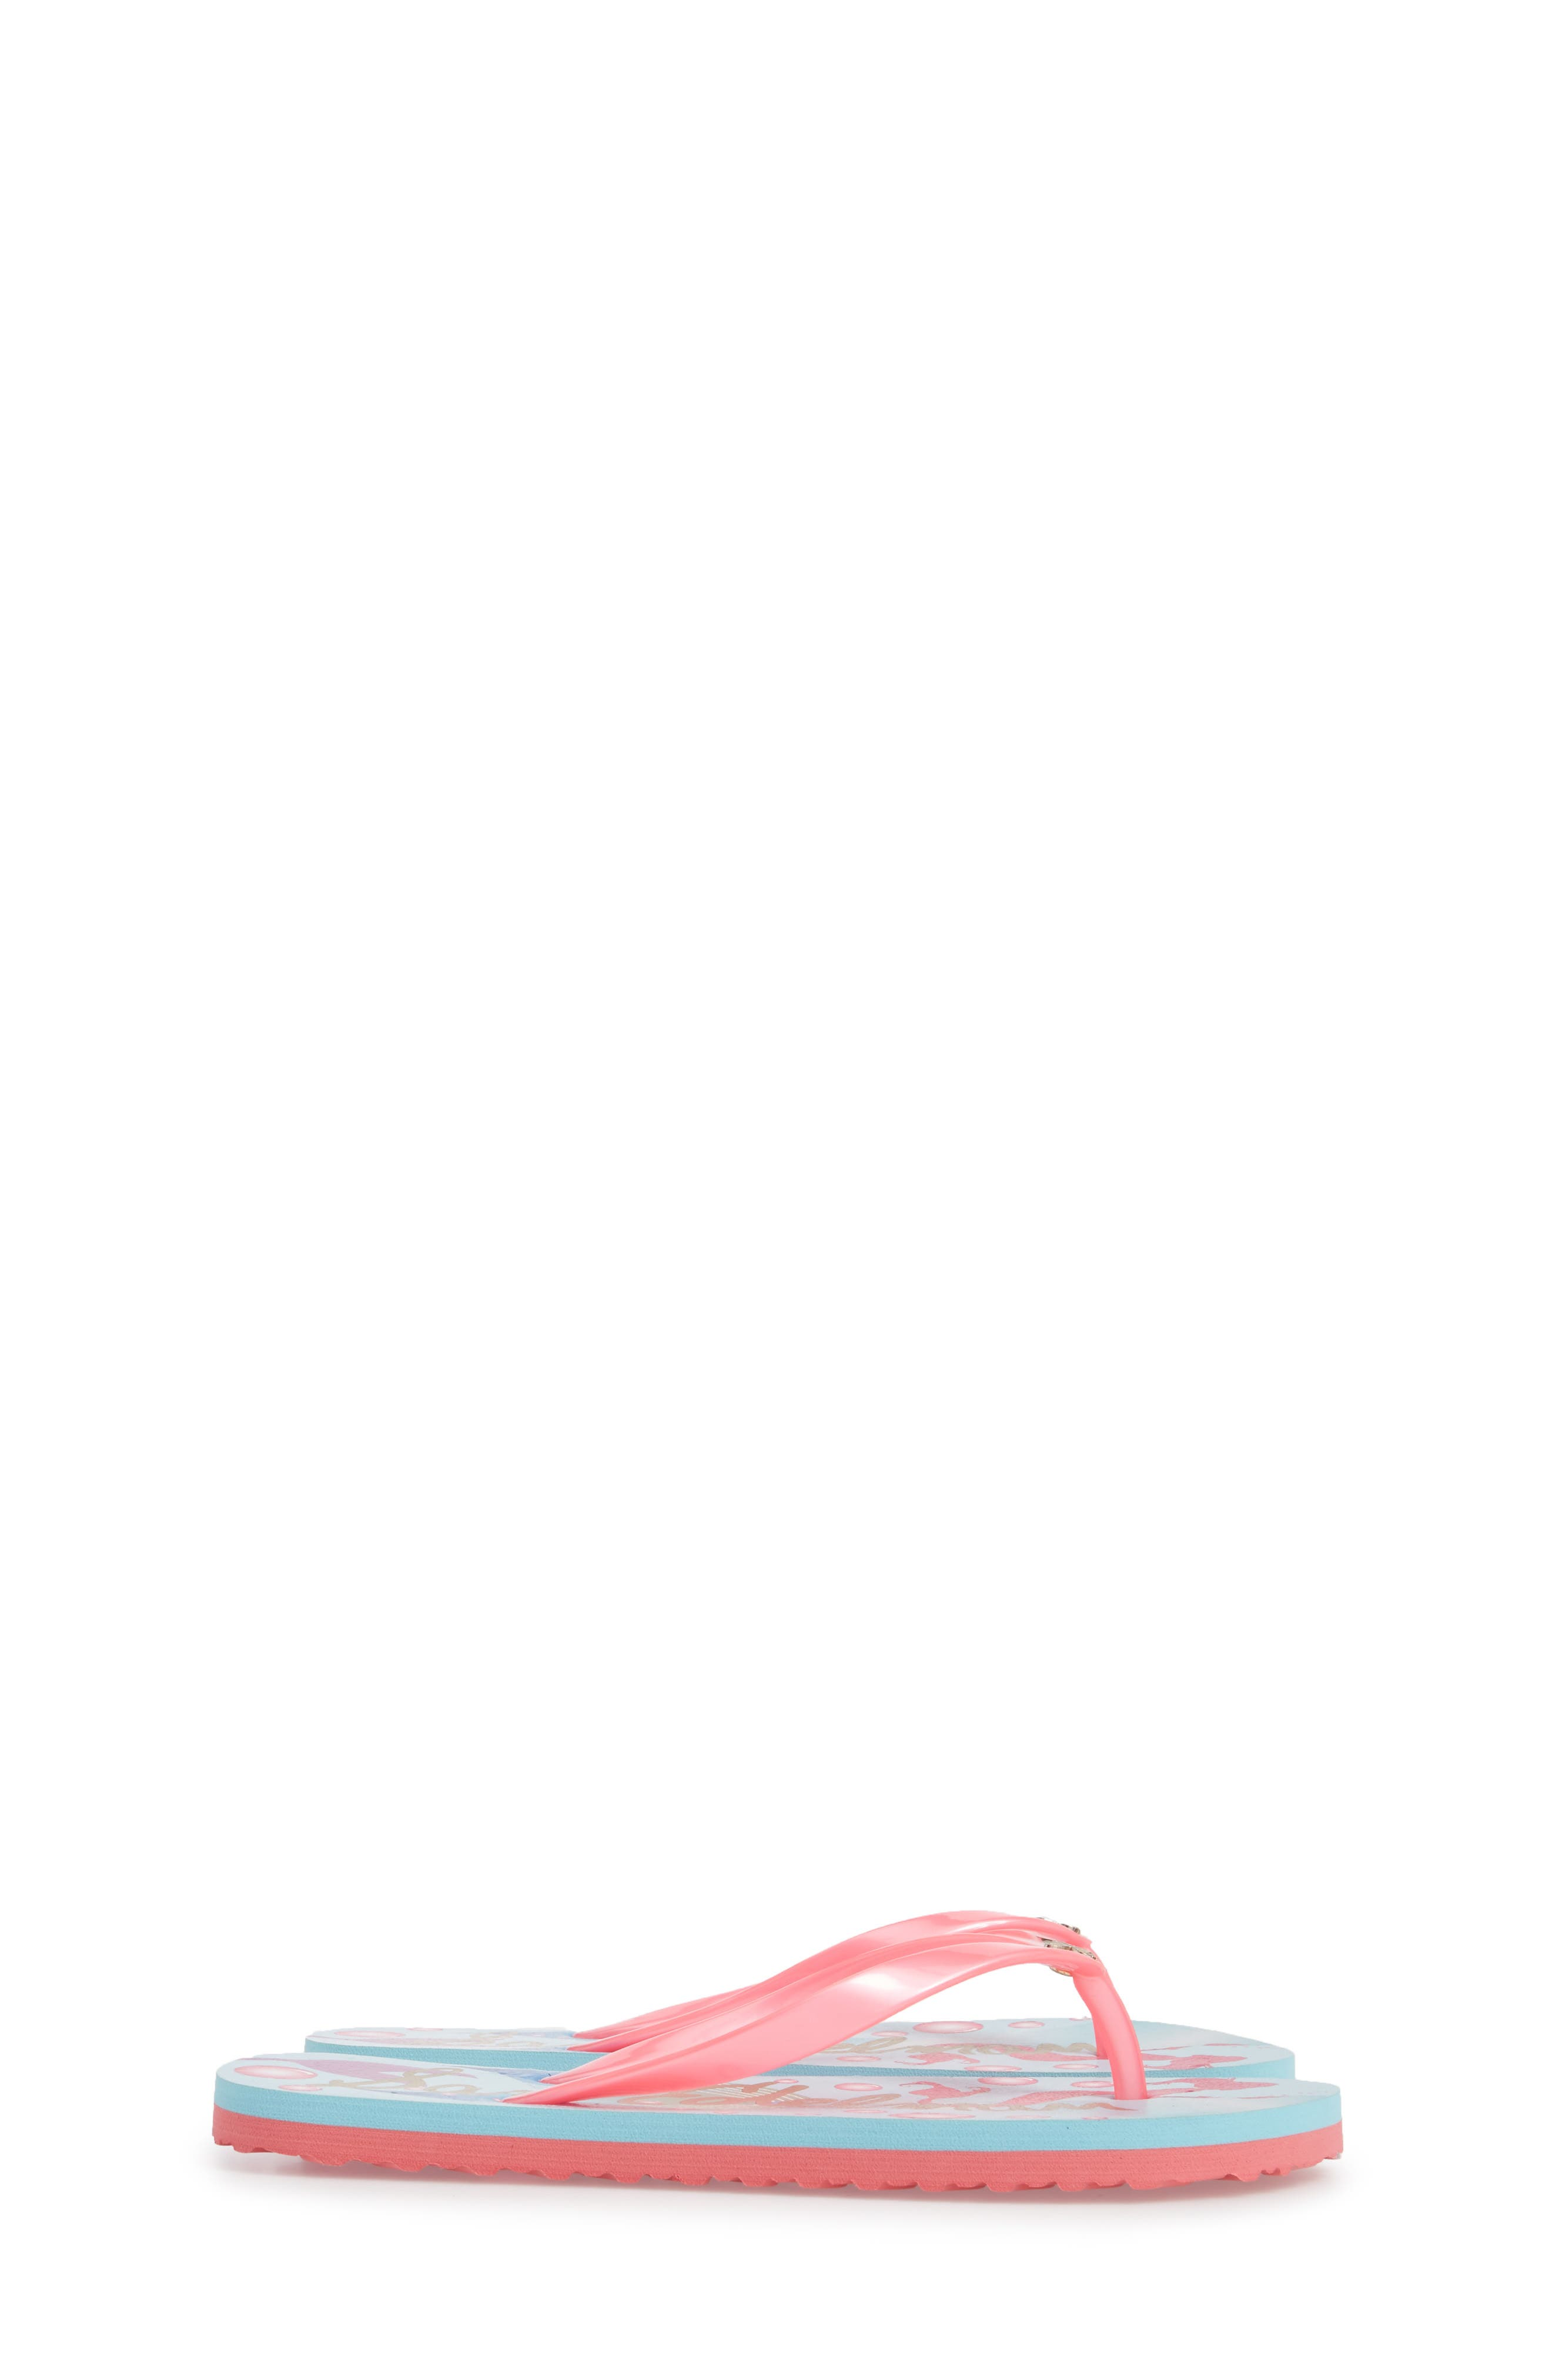 Mandy Flip Flop,                             Alternate thumbnail 4, color,                             Mermaid Turquoise/ Pink